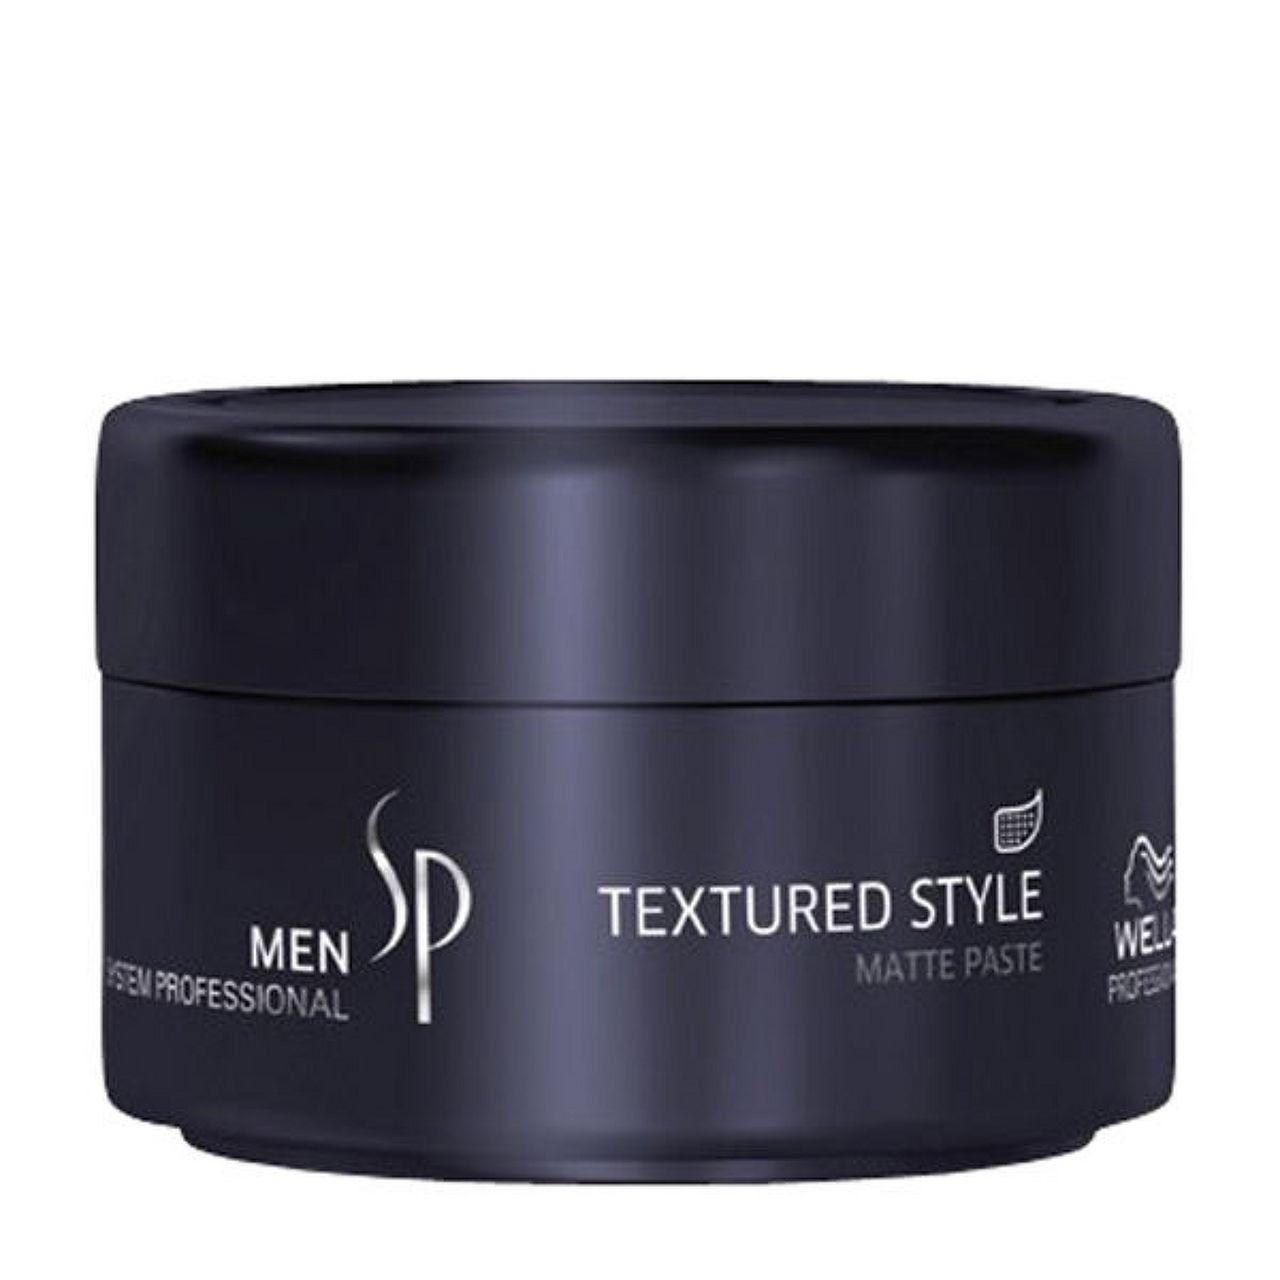 Sp Men Textured Style 75ml imagine produs